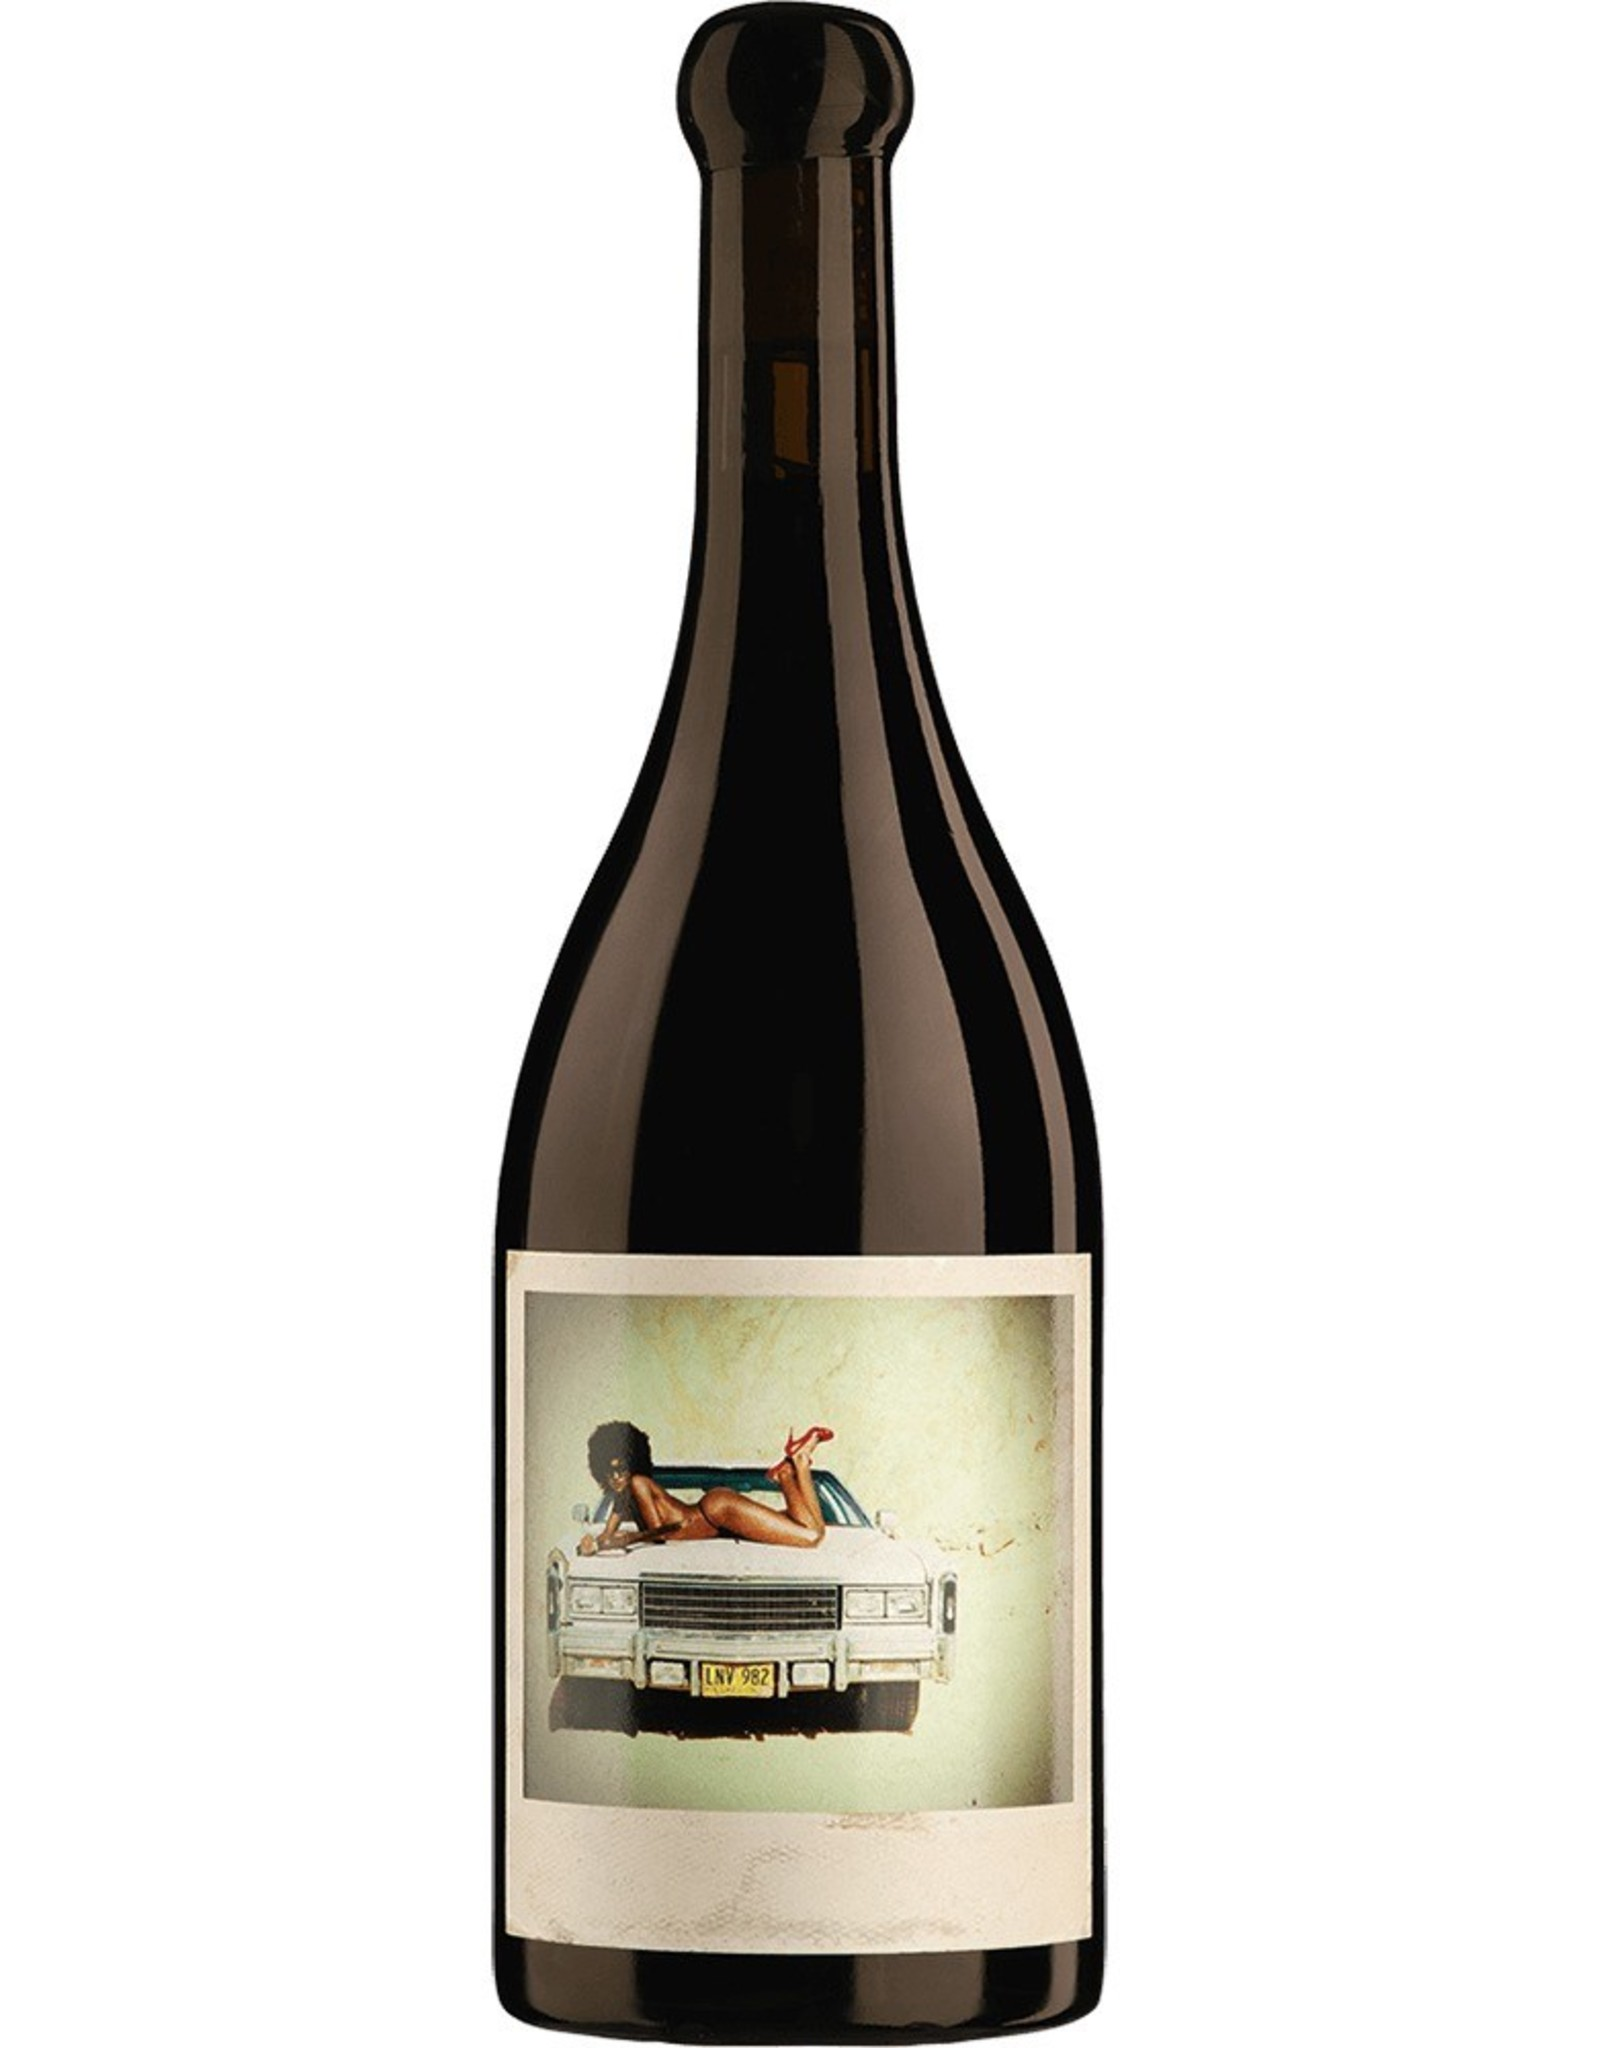 Red Wine 2018, Orin Swift Machete, Red Blend, Multi-regional Blend, Napa Valley, California, 15.7% Alc, CT90